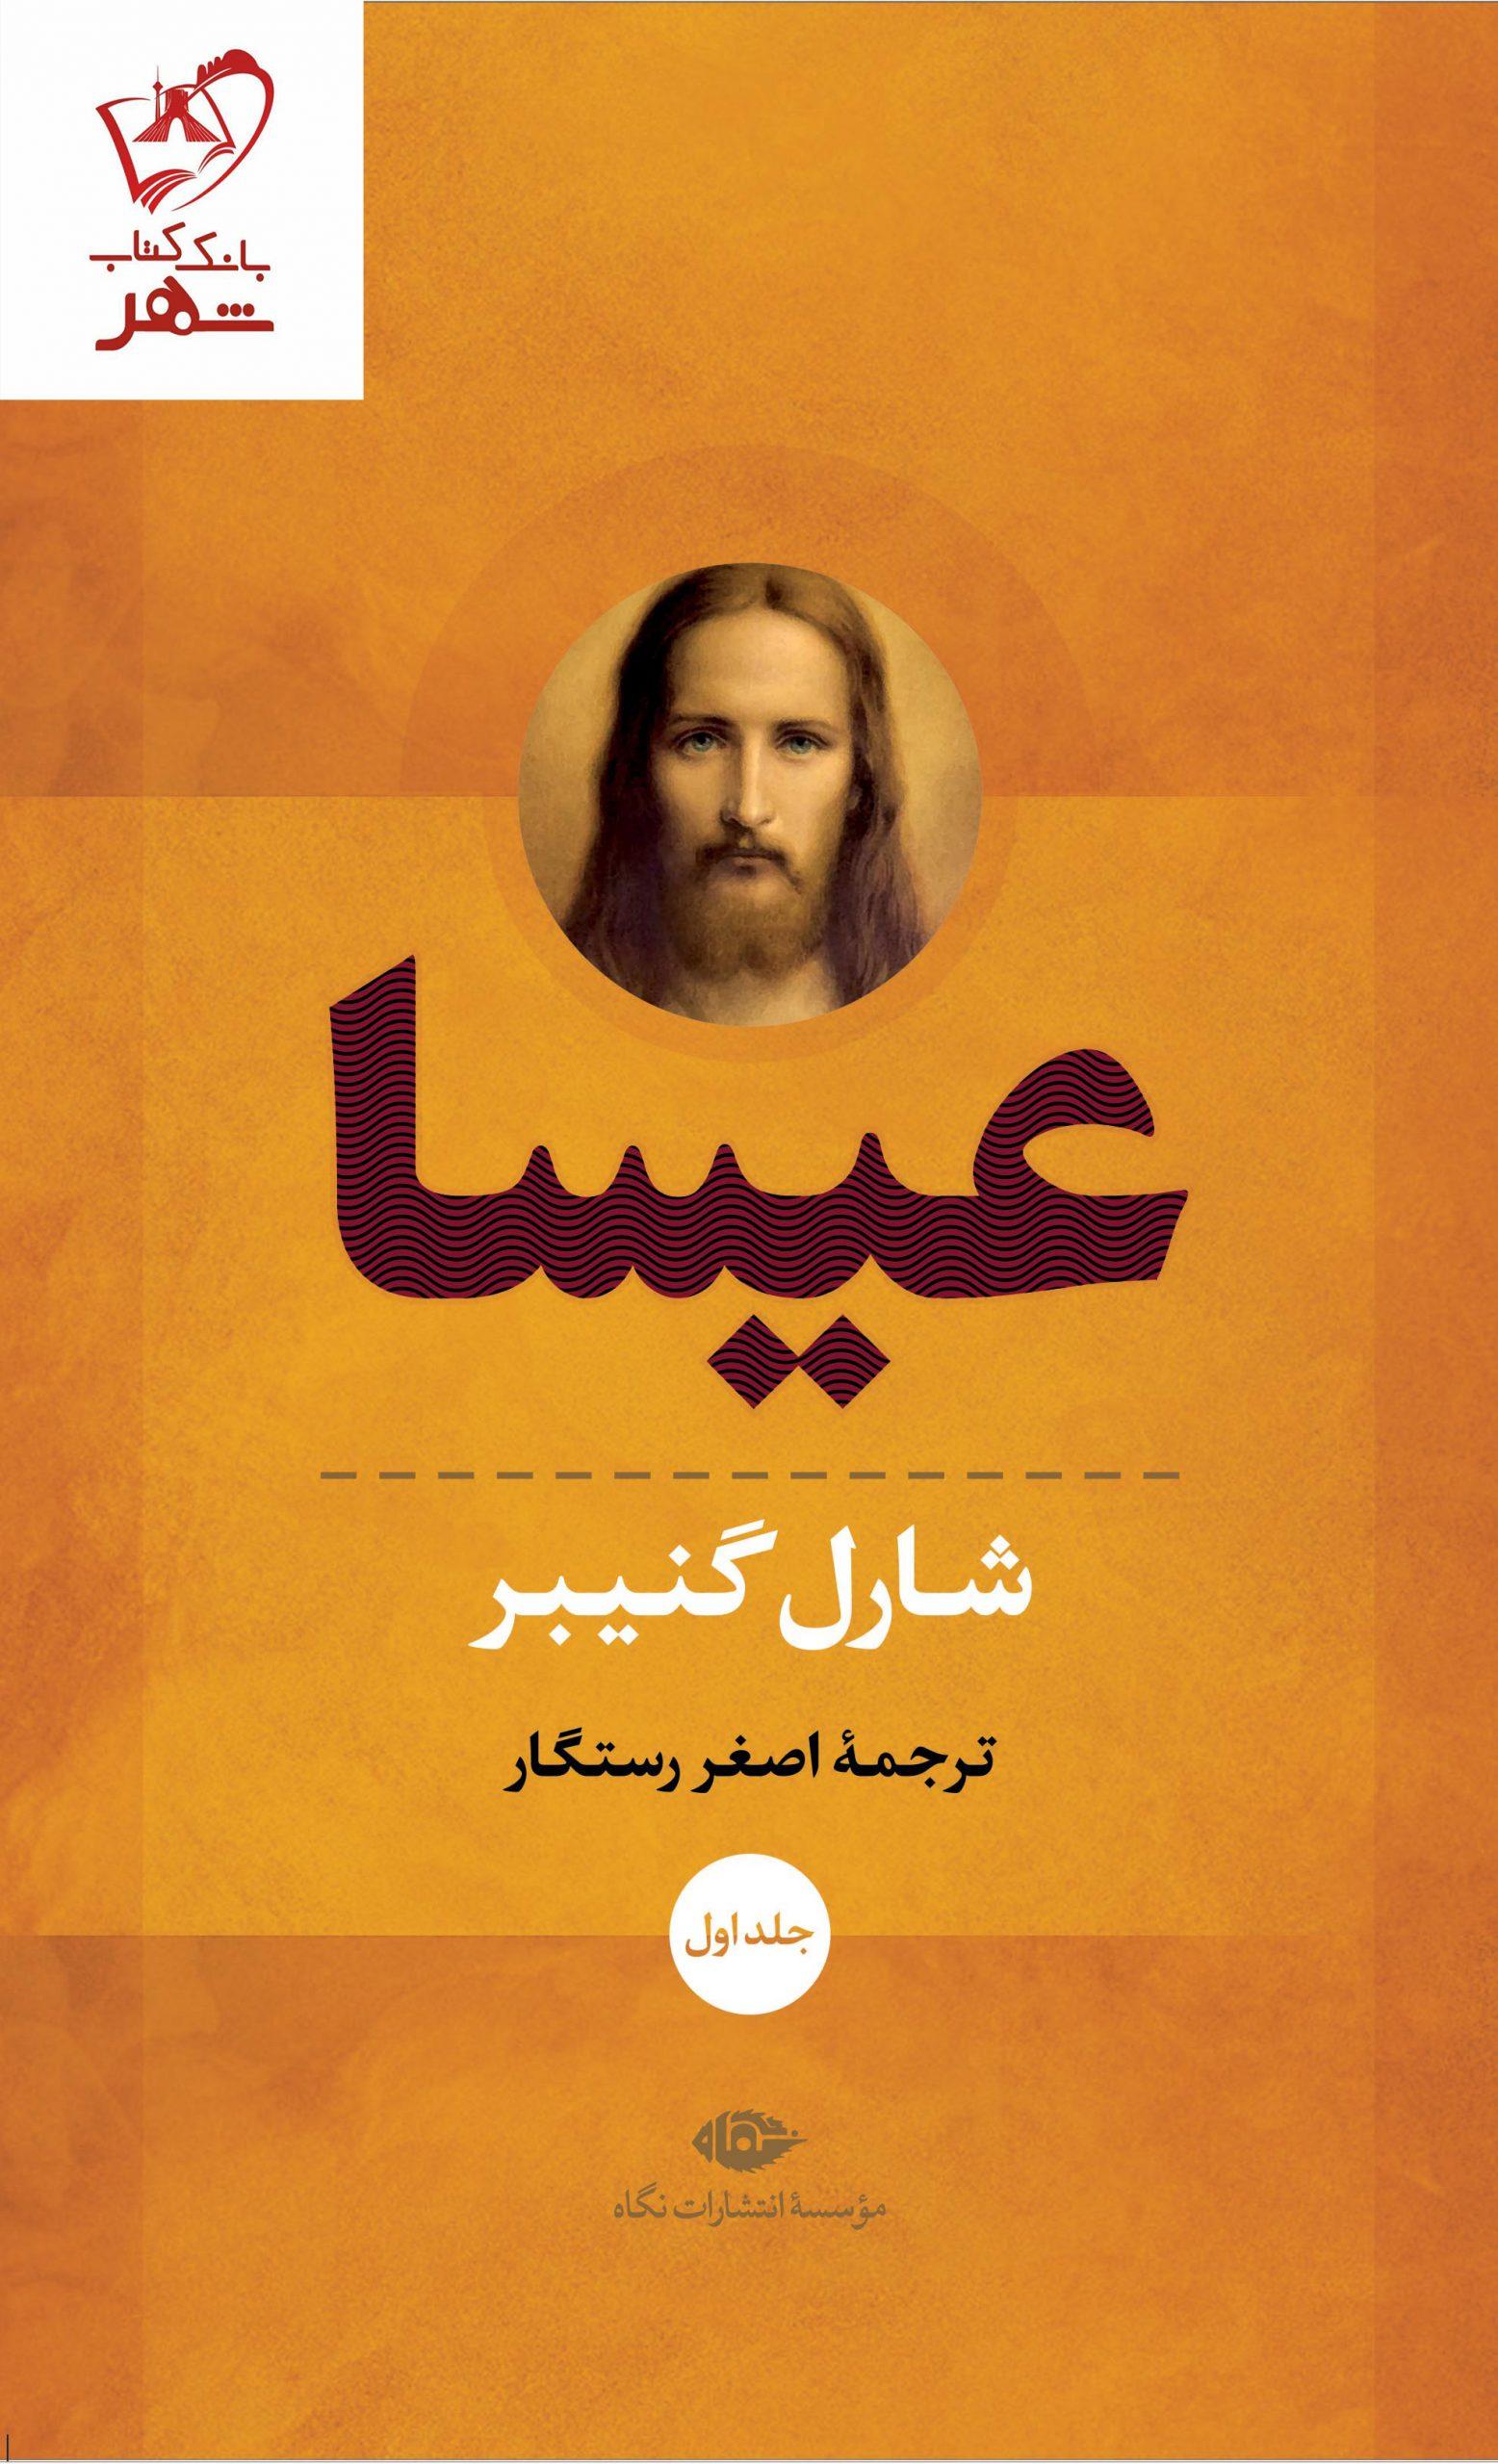 خرید کتاب عیسا (دوره 2 جلدی) اثر شارل گنیبر ترجمه اصغر رستگار نشر نگاه